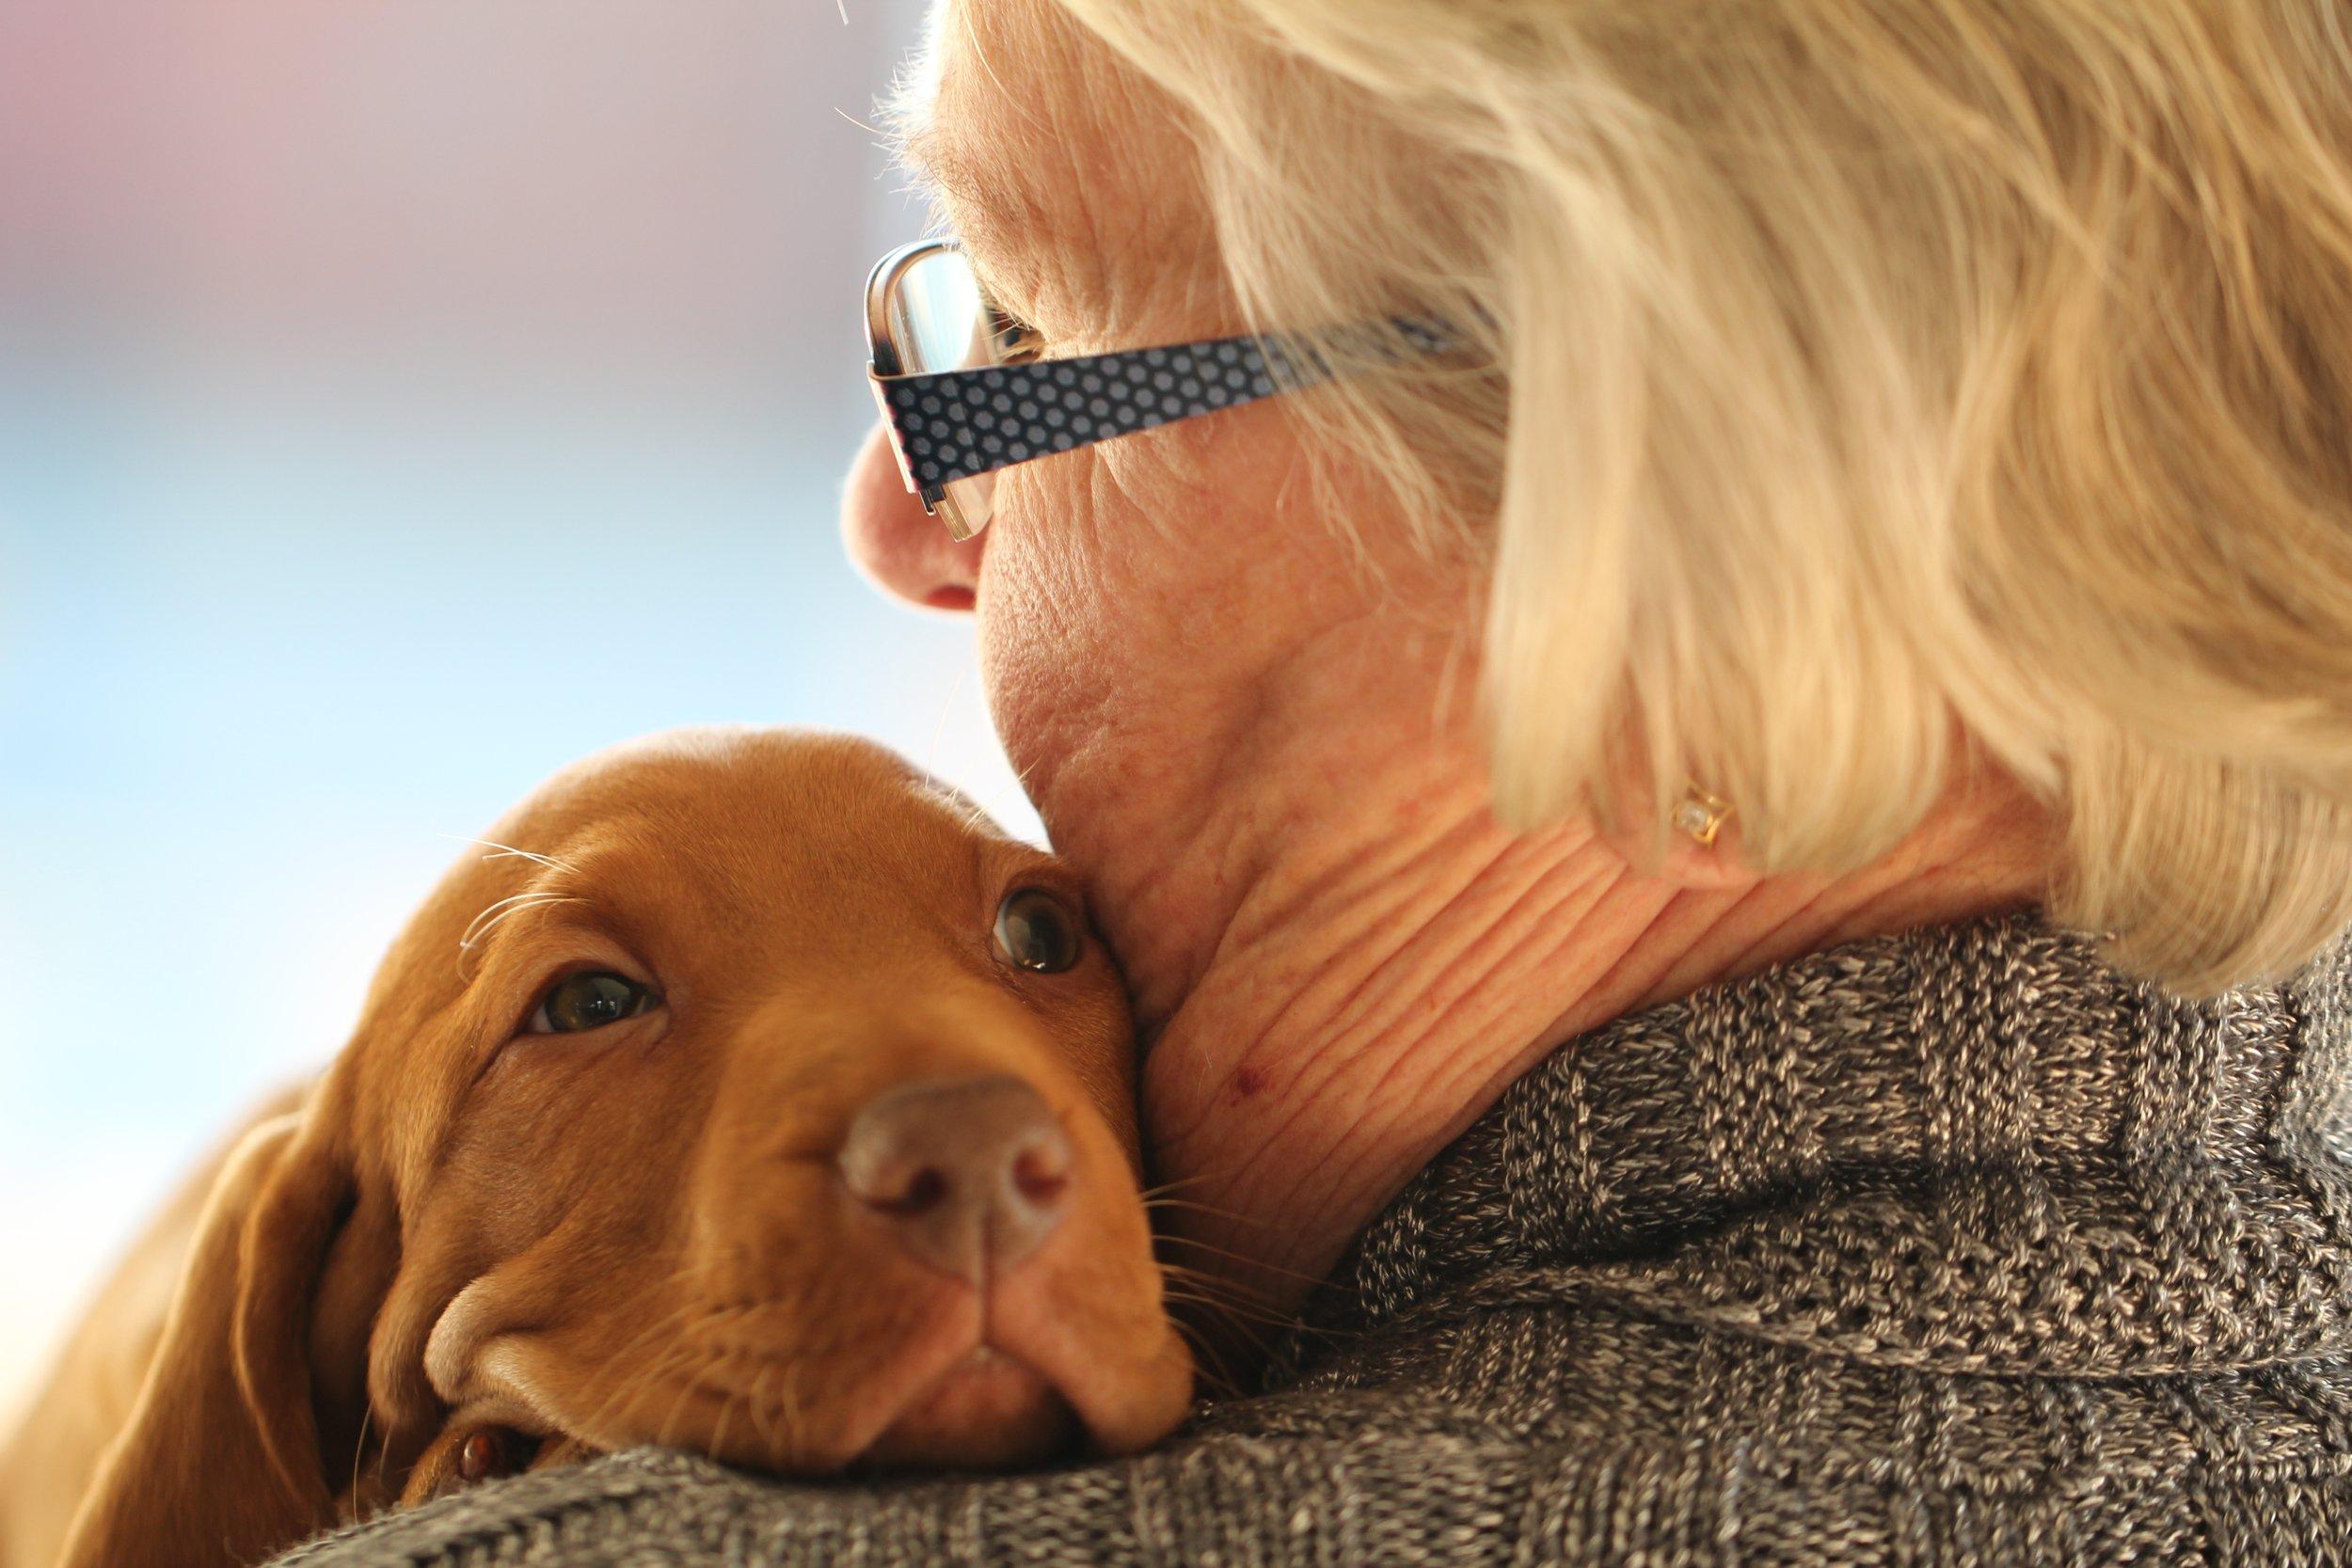 woman-old-puppy-dog-cute-love-1176463-pxhere.com.jpg